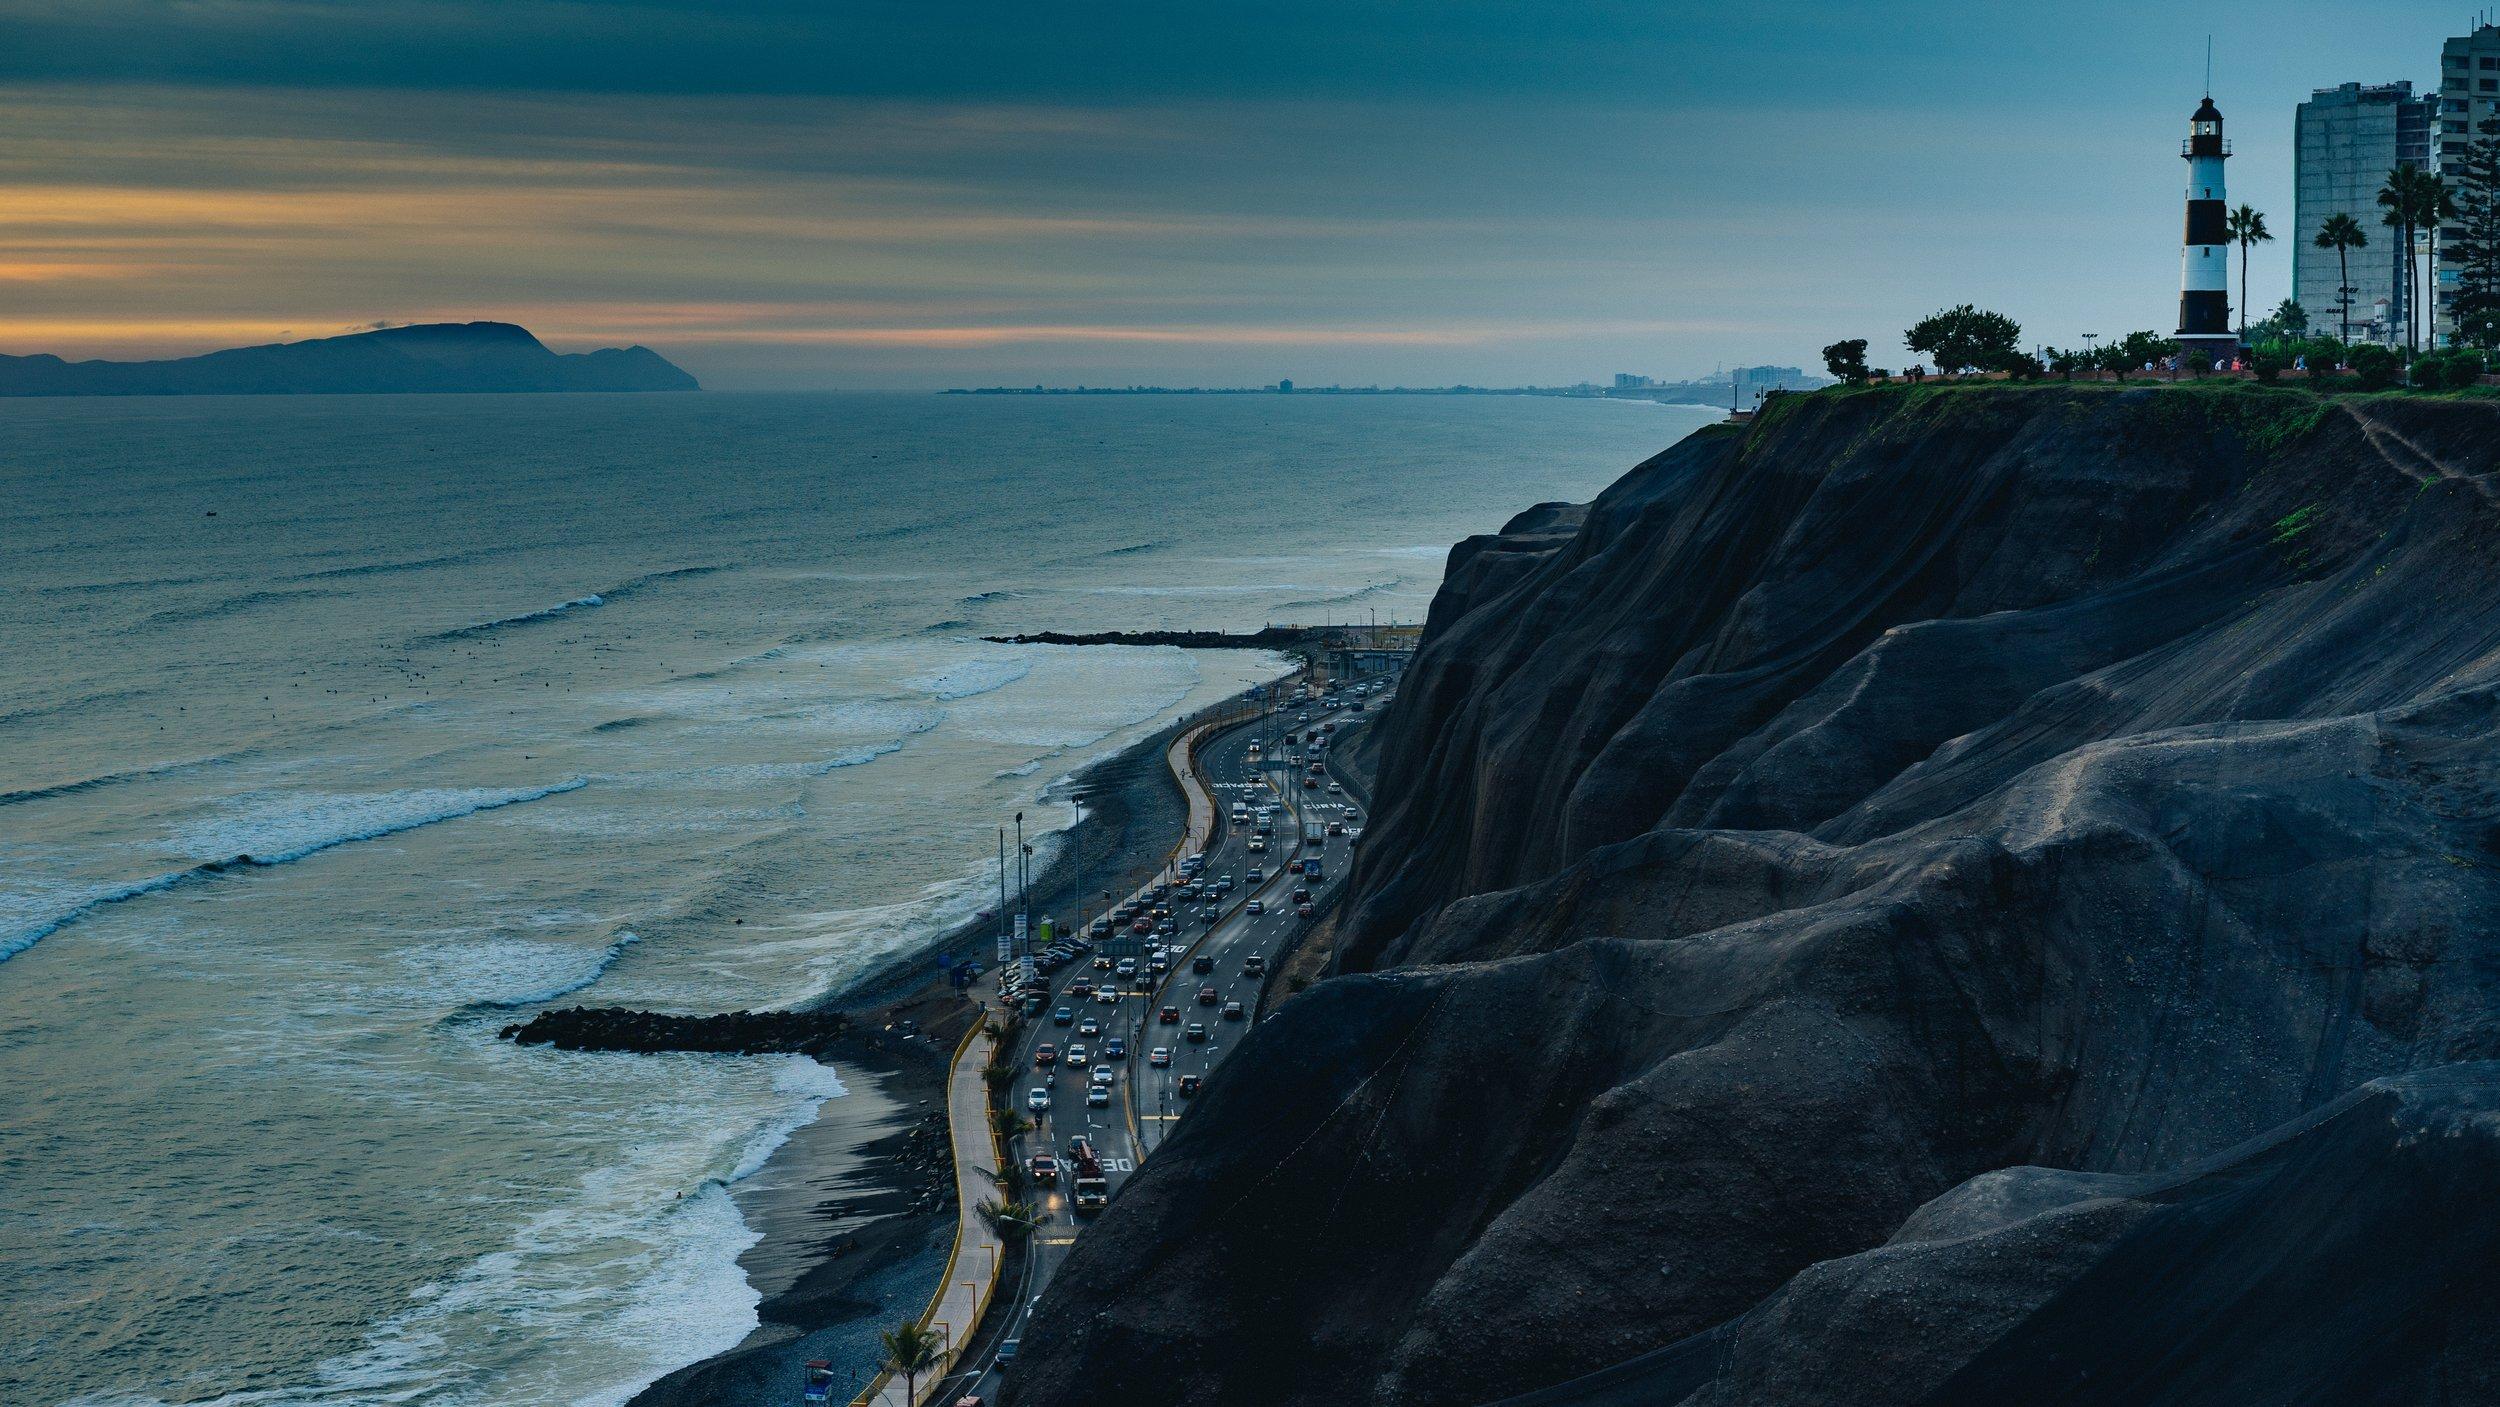 Copy of Lima - Peru EdOdyssey (Miraflores)